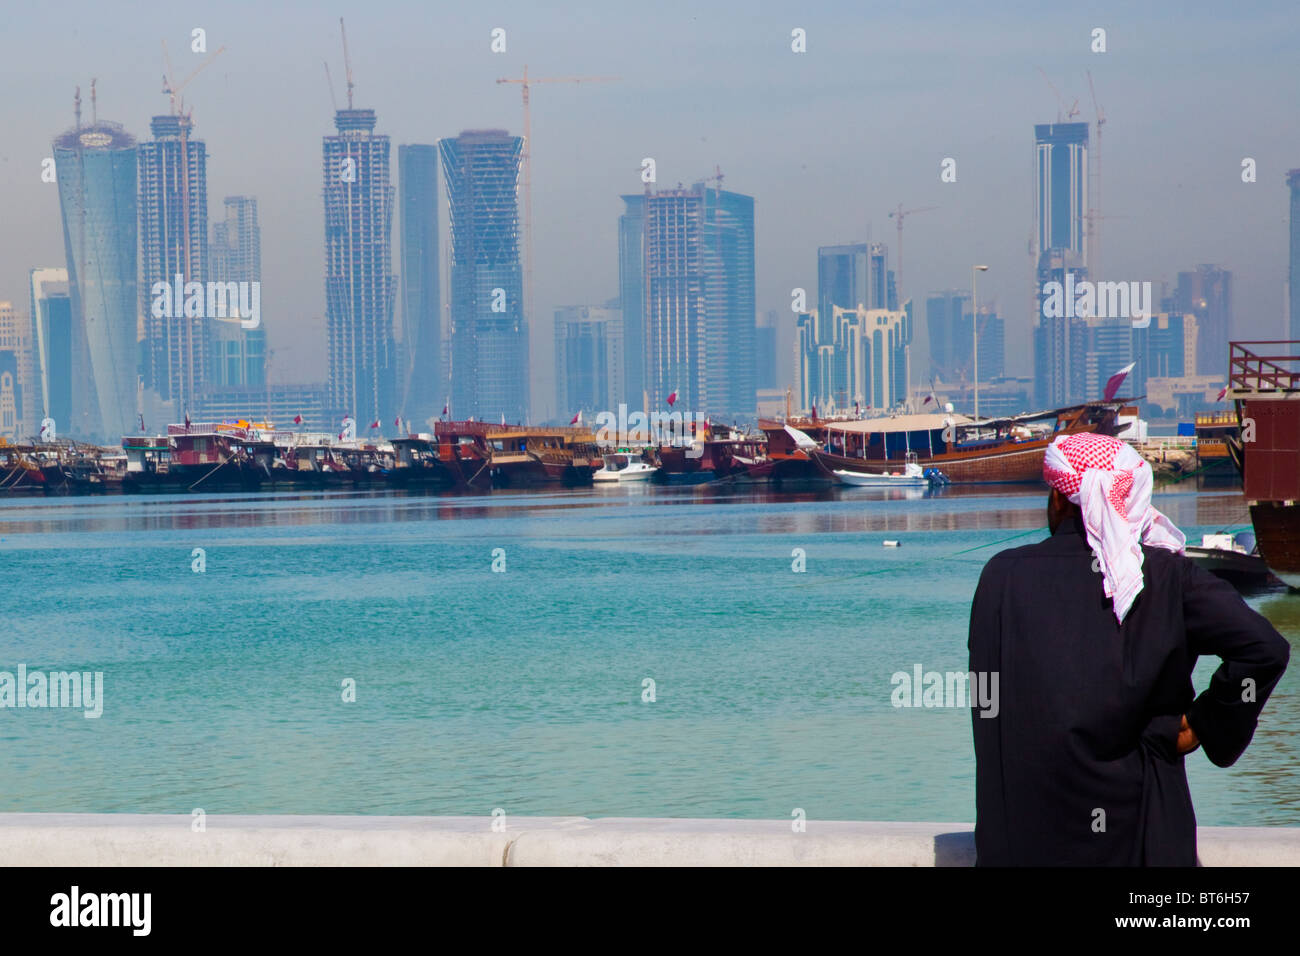 Skyscraper Construction Skyline in Doha Qatar - Stock Image